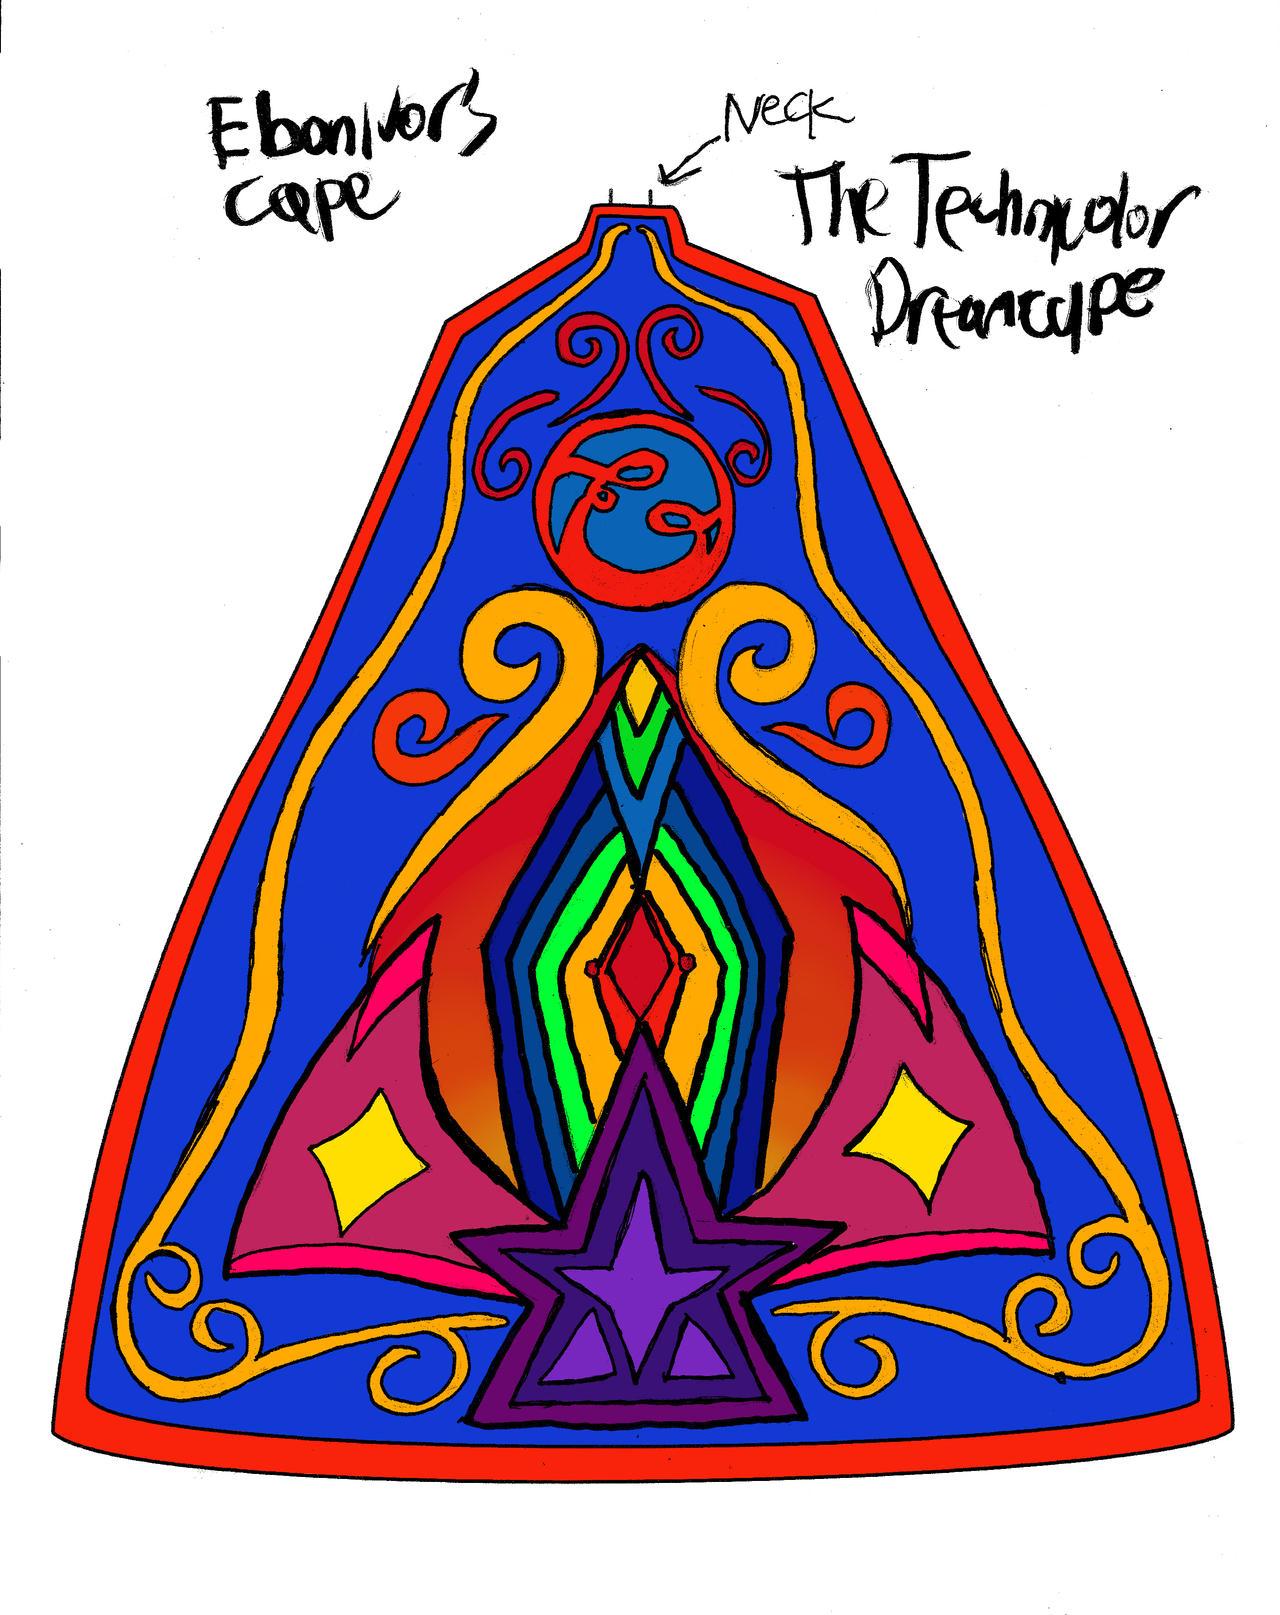 The Technicolor Dreamcape by RedJoey1992